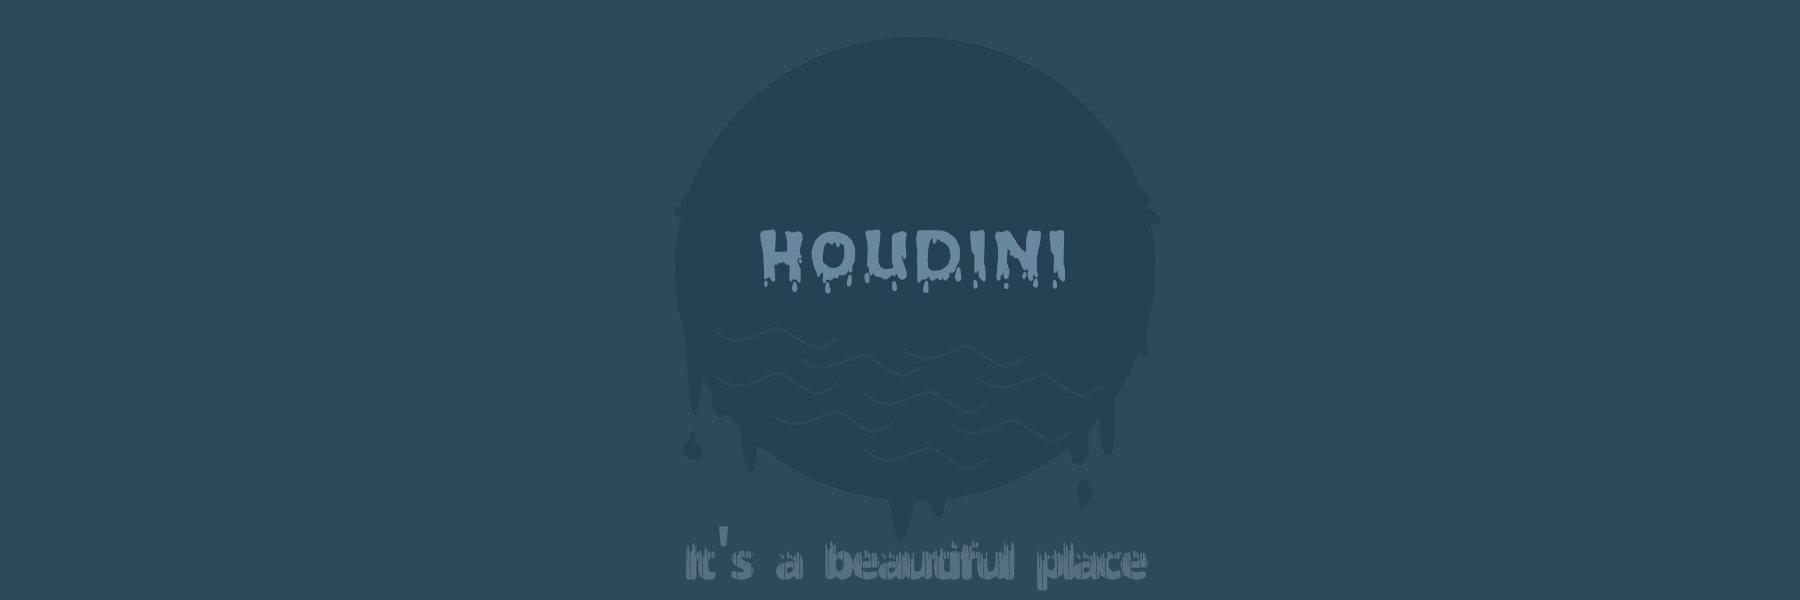 Houdini poster by Joseph Rex